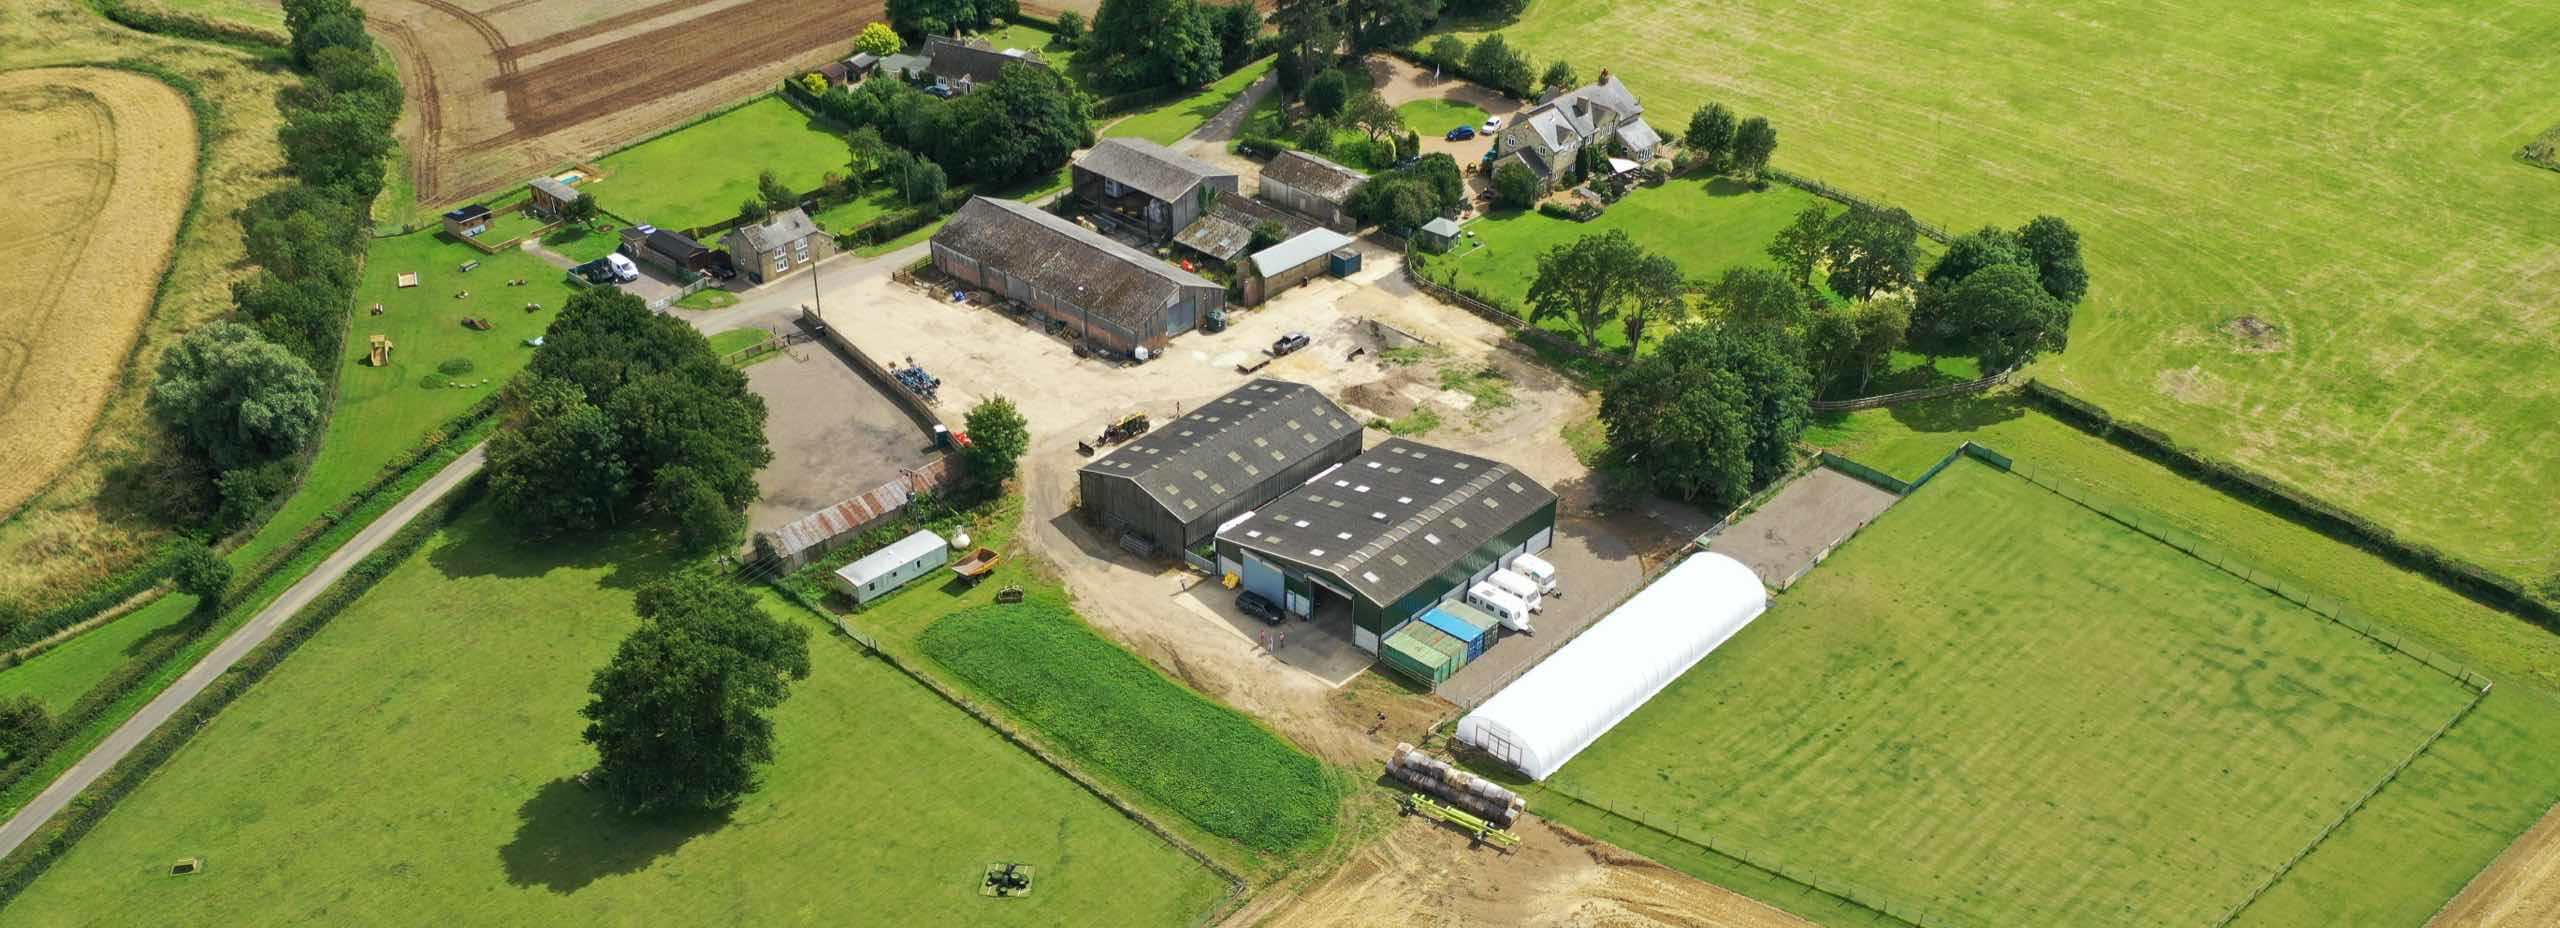 Holly Lodge Farm